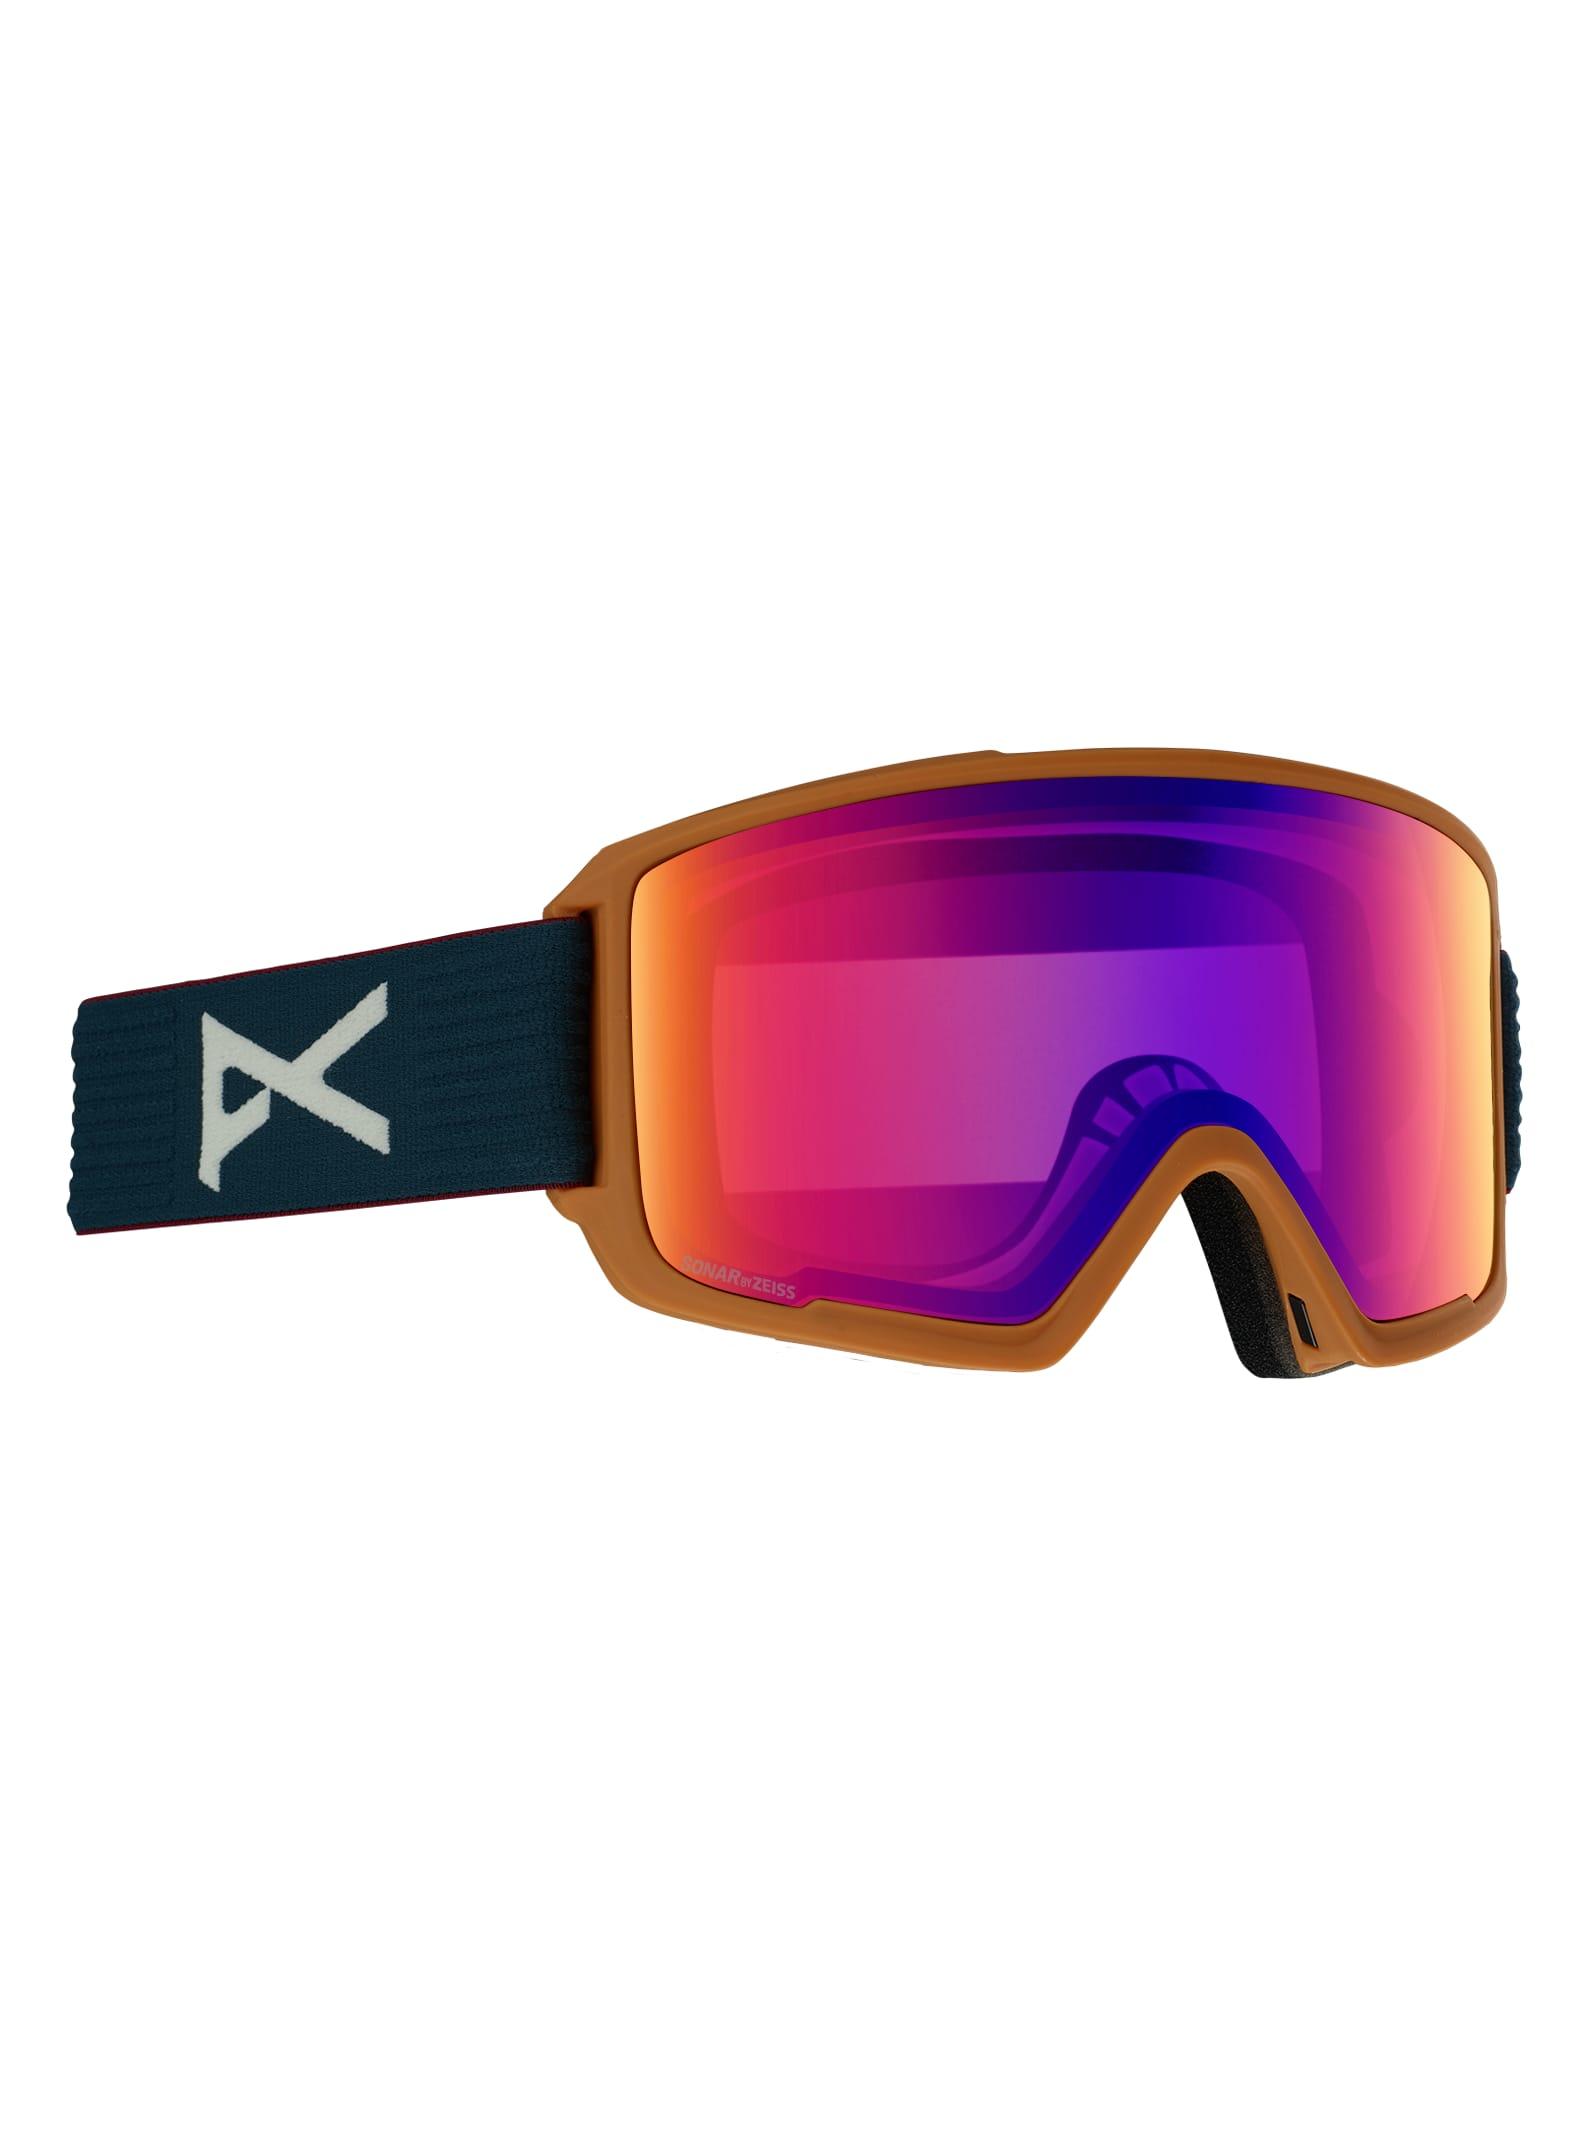 Anon Men's M3 Goggle + Spare Lens, Frame: DOA, Lens: SONAR Infrared Blue, Spare Lens: SONAR Bronze